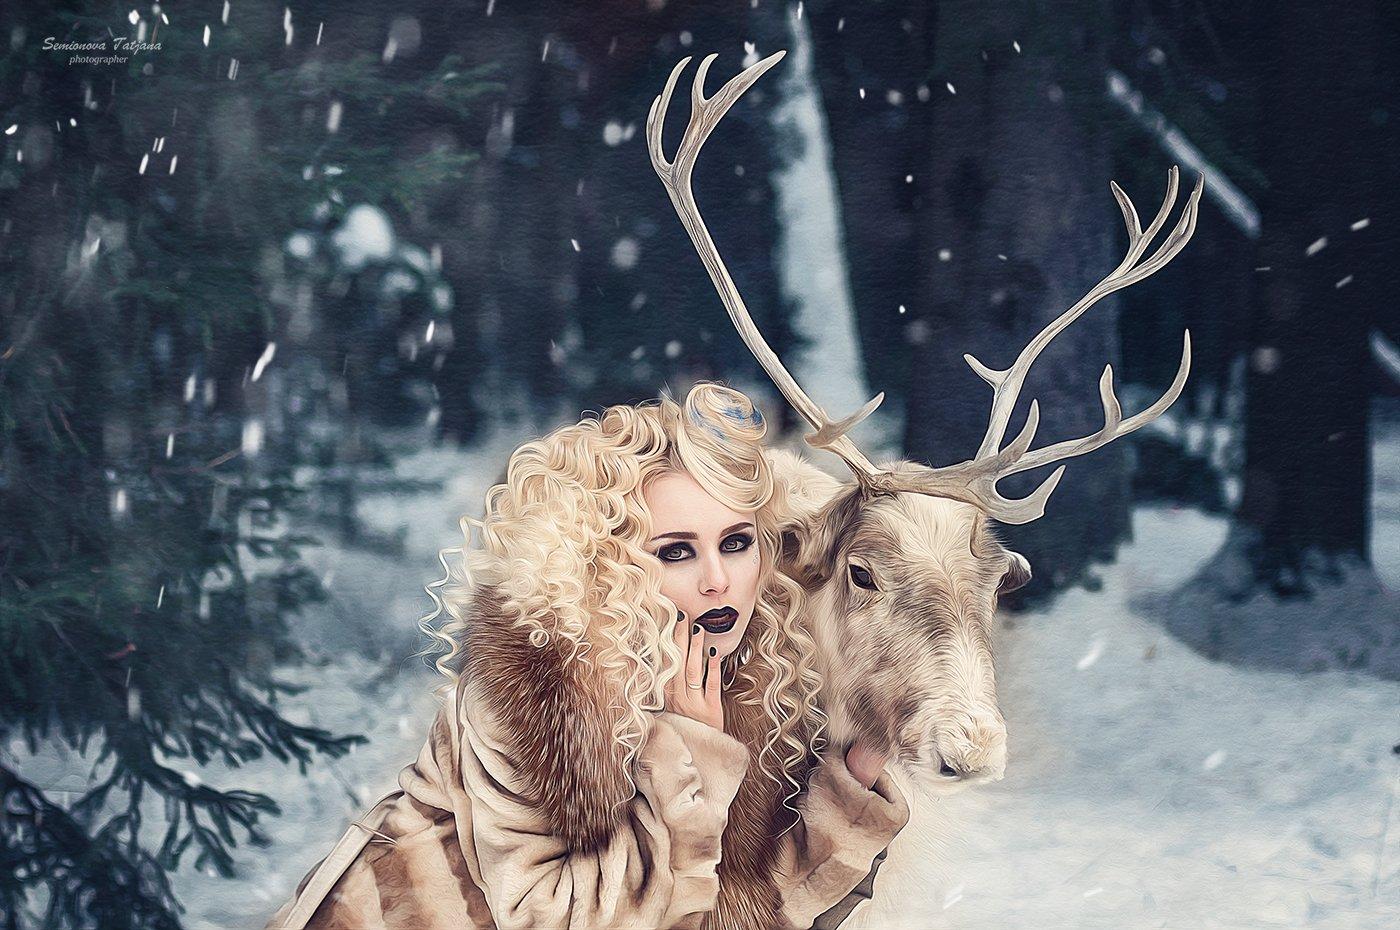 Олень, красота, зима, снег, Семенова Татьяна